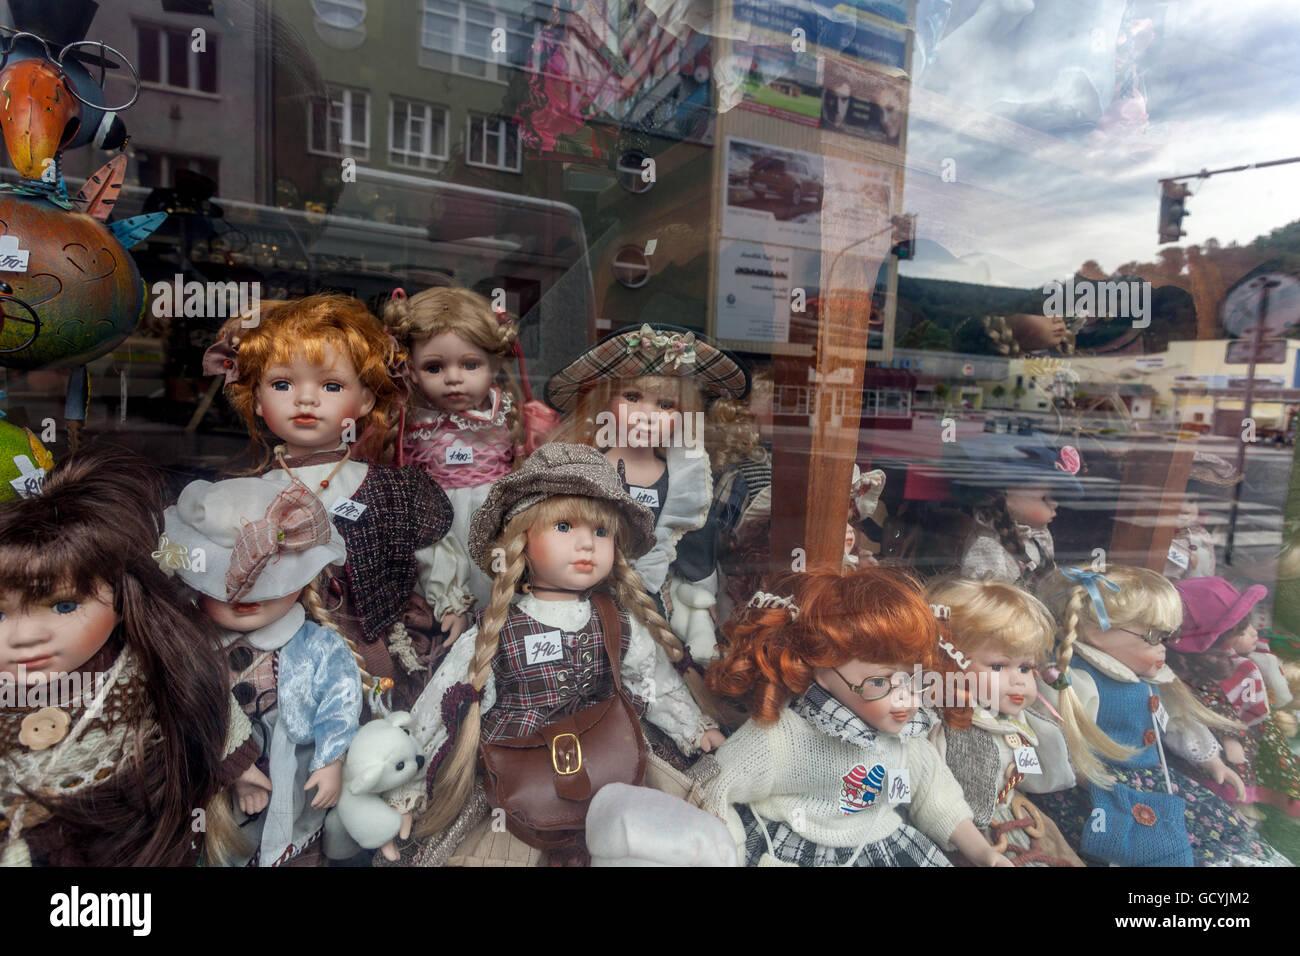 Shop window display, dolls, city Decin, North Bohemia, Czech Republic - Stock Image